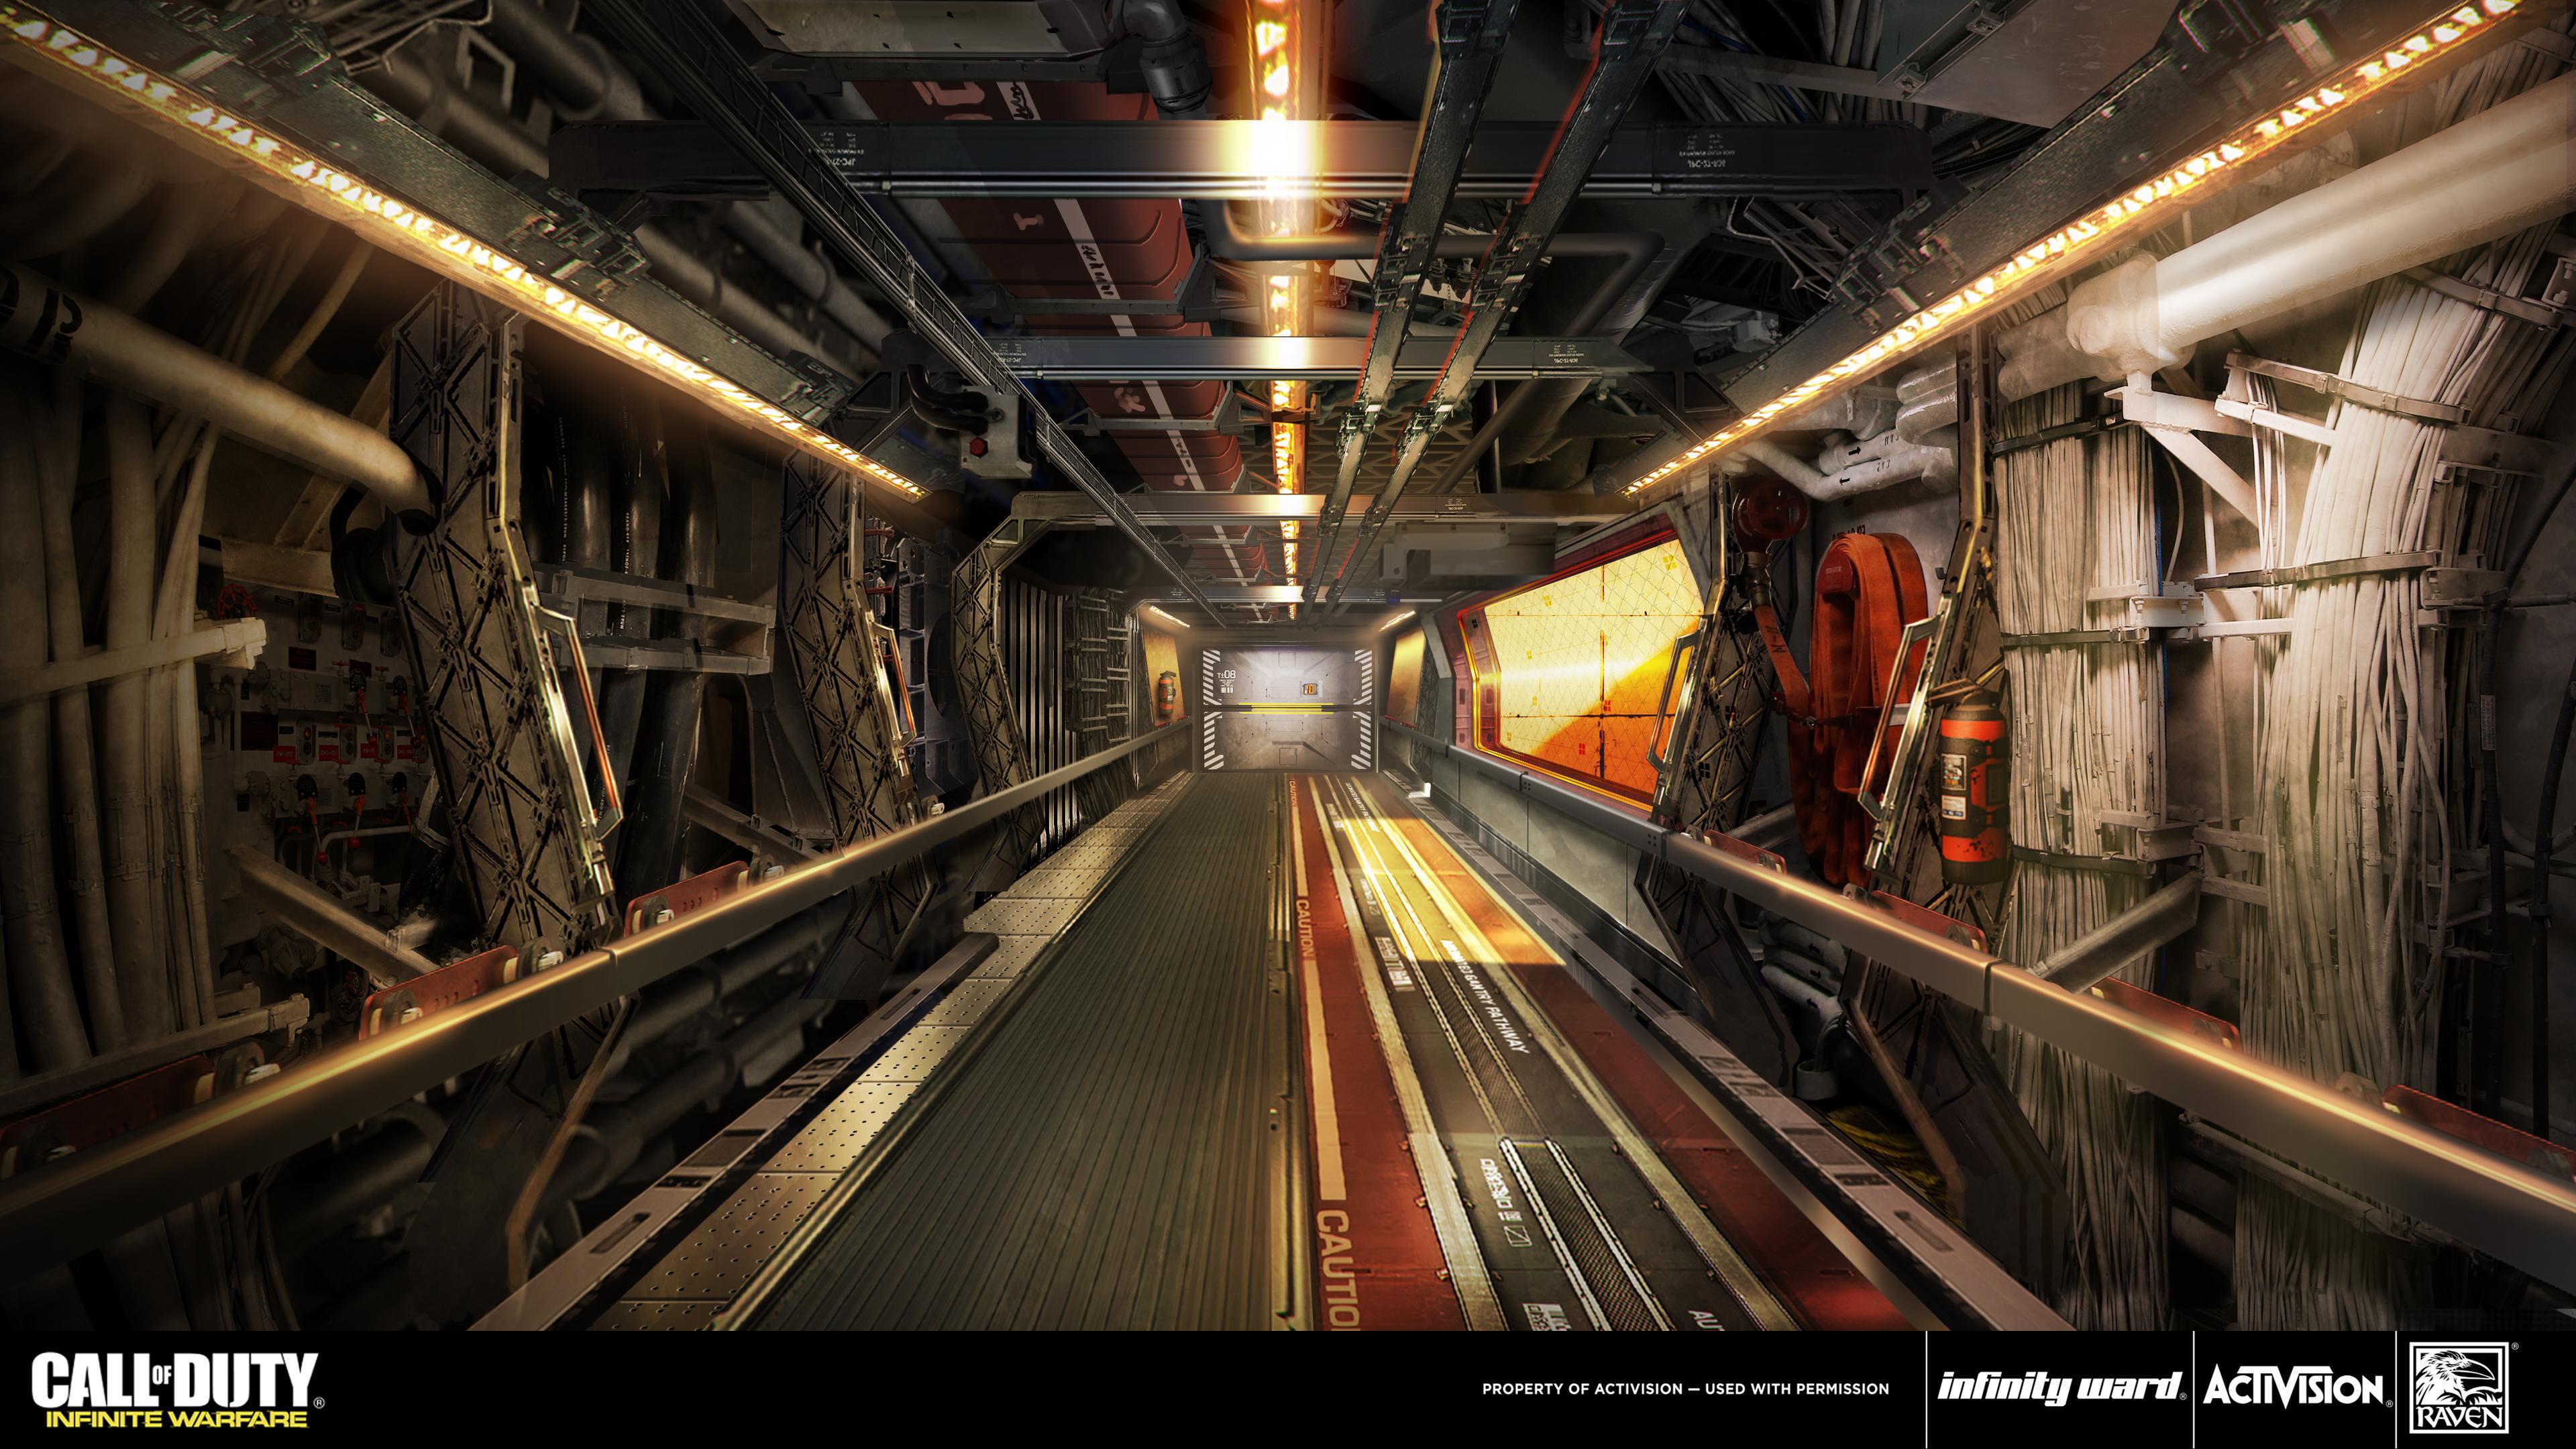 ENV_sko_iw7_11-17-15_sdf_corridor_bare